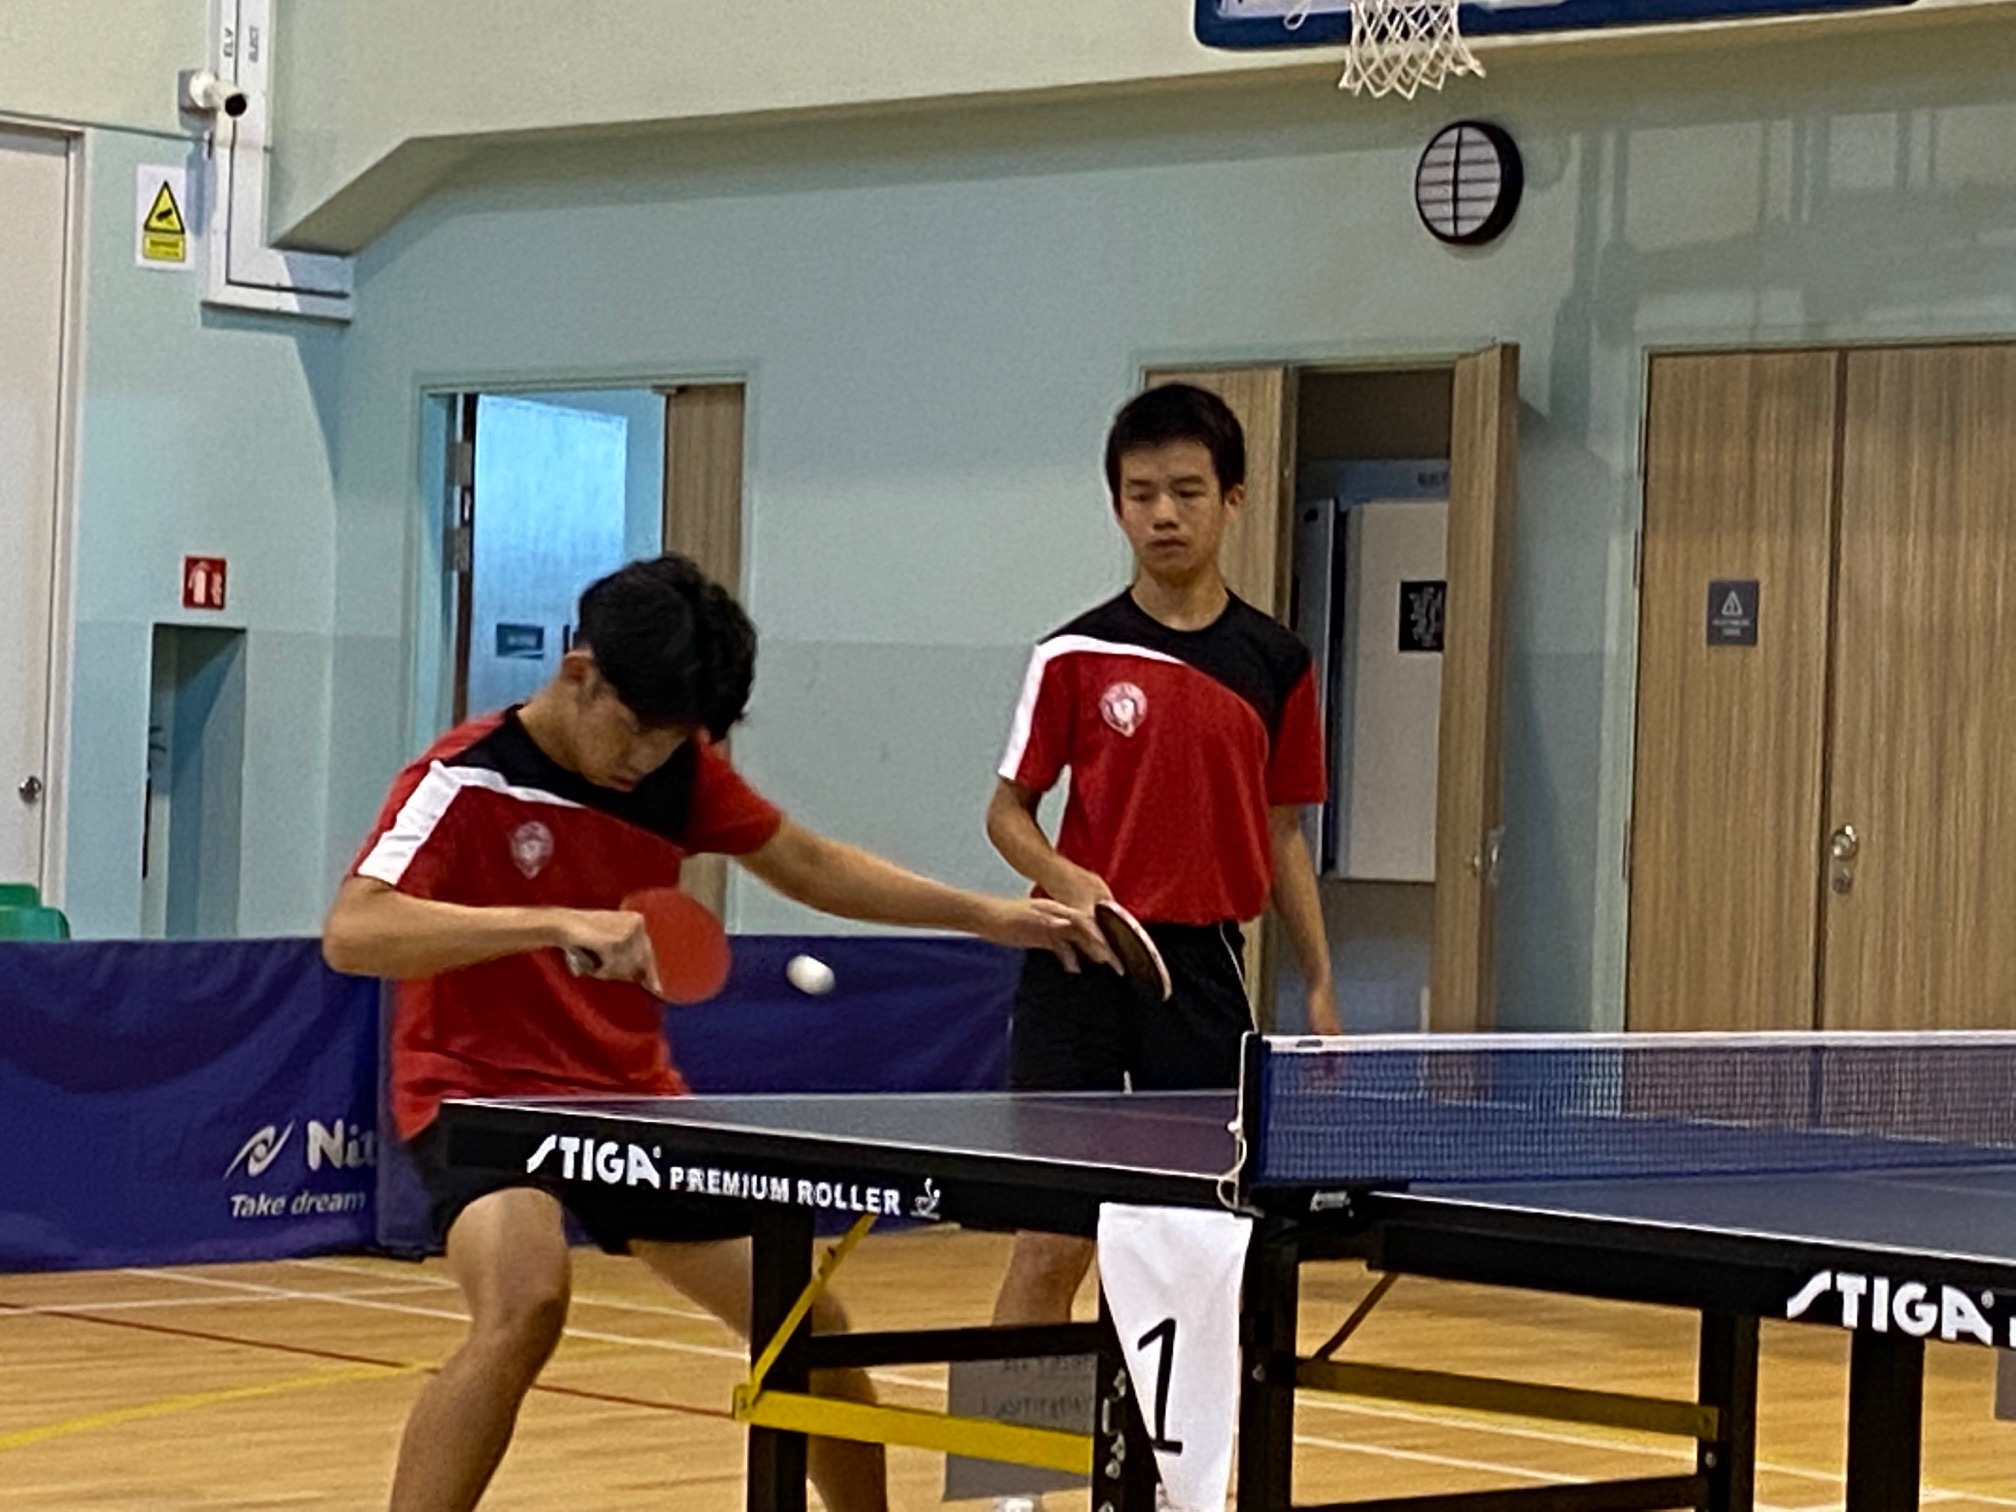 NSG B Div boys table tennis - Victoria School 2nd doubles players Jordan Pang and Reuben Yap